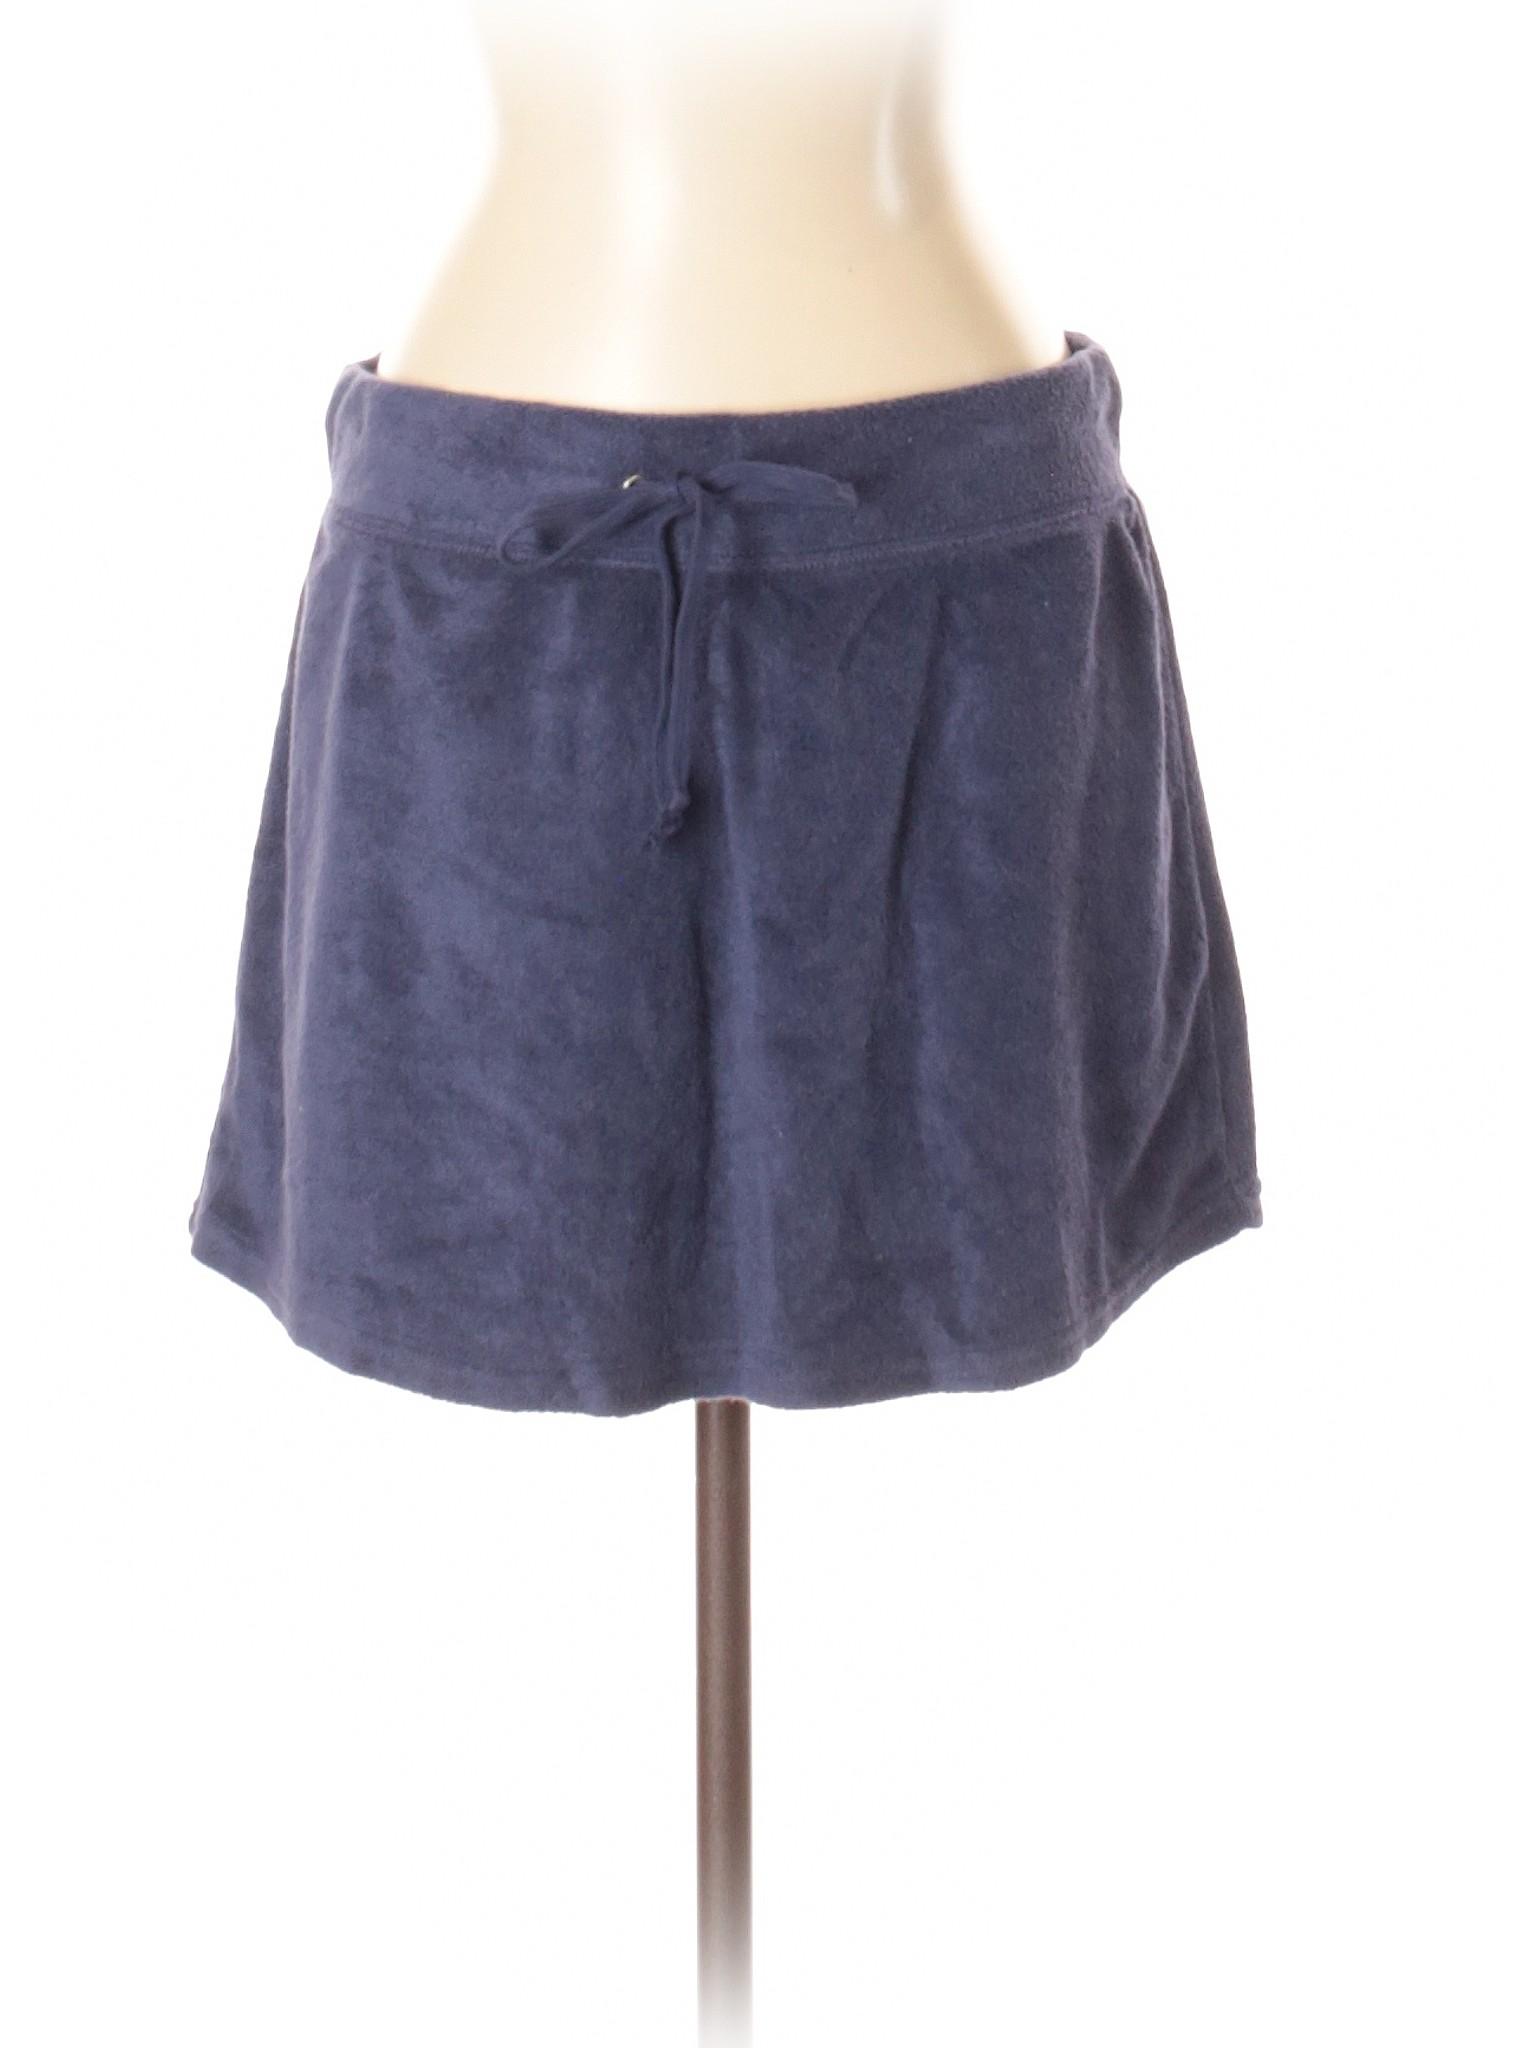 Boutique Skirt Skirt Skirt Casual Casual Boutique Casual Boutique wfqd5w0